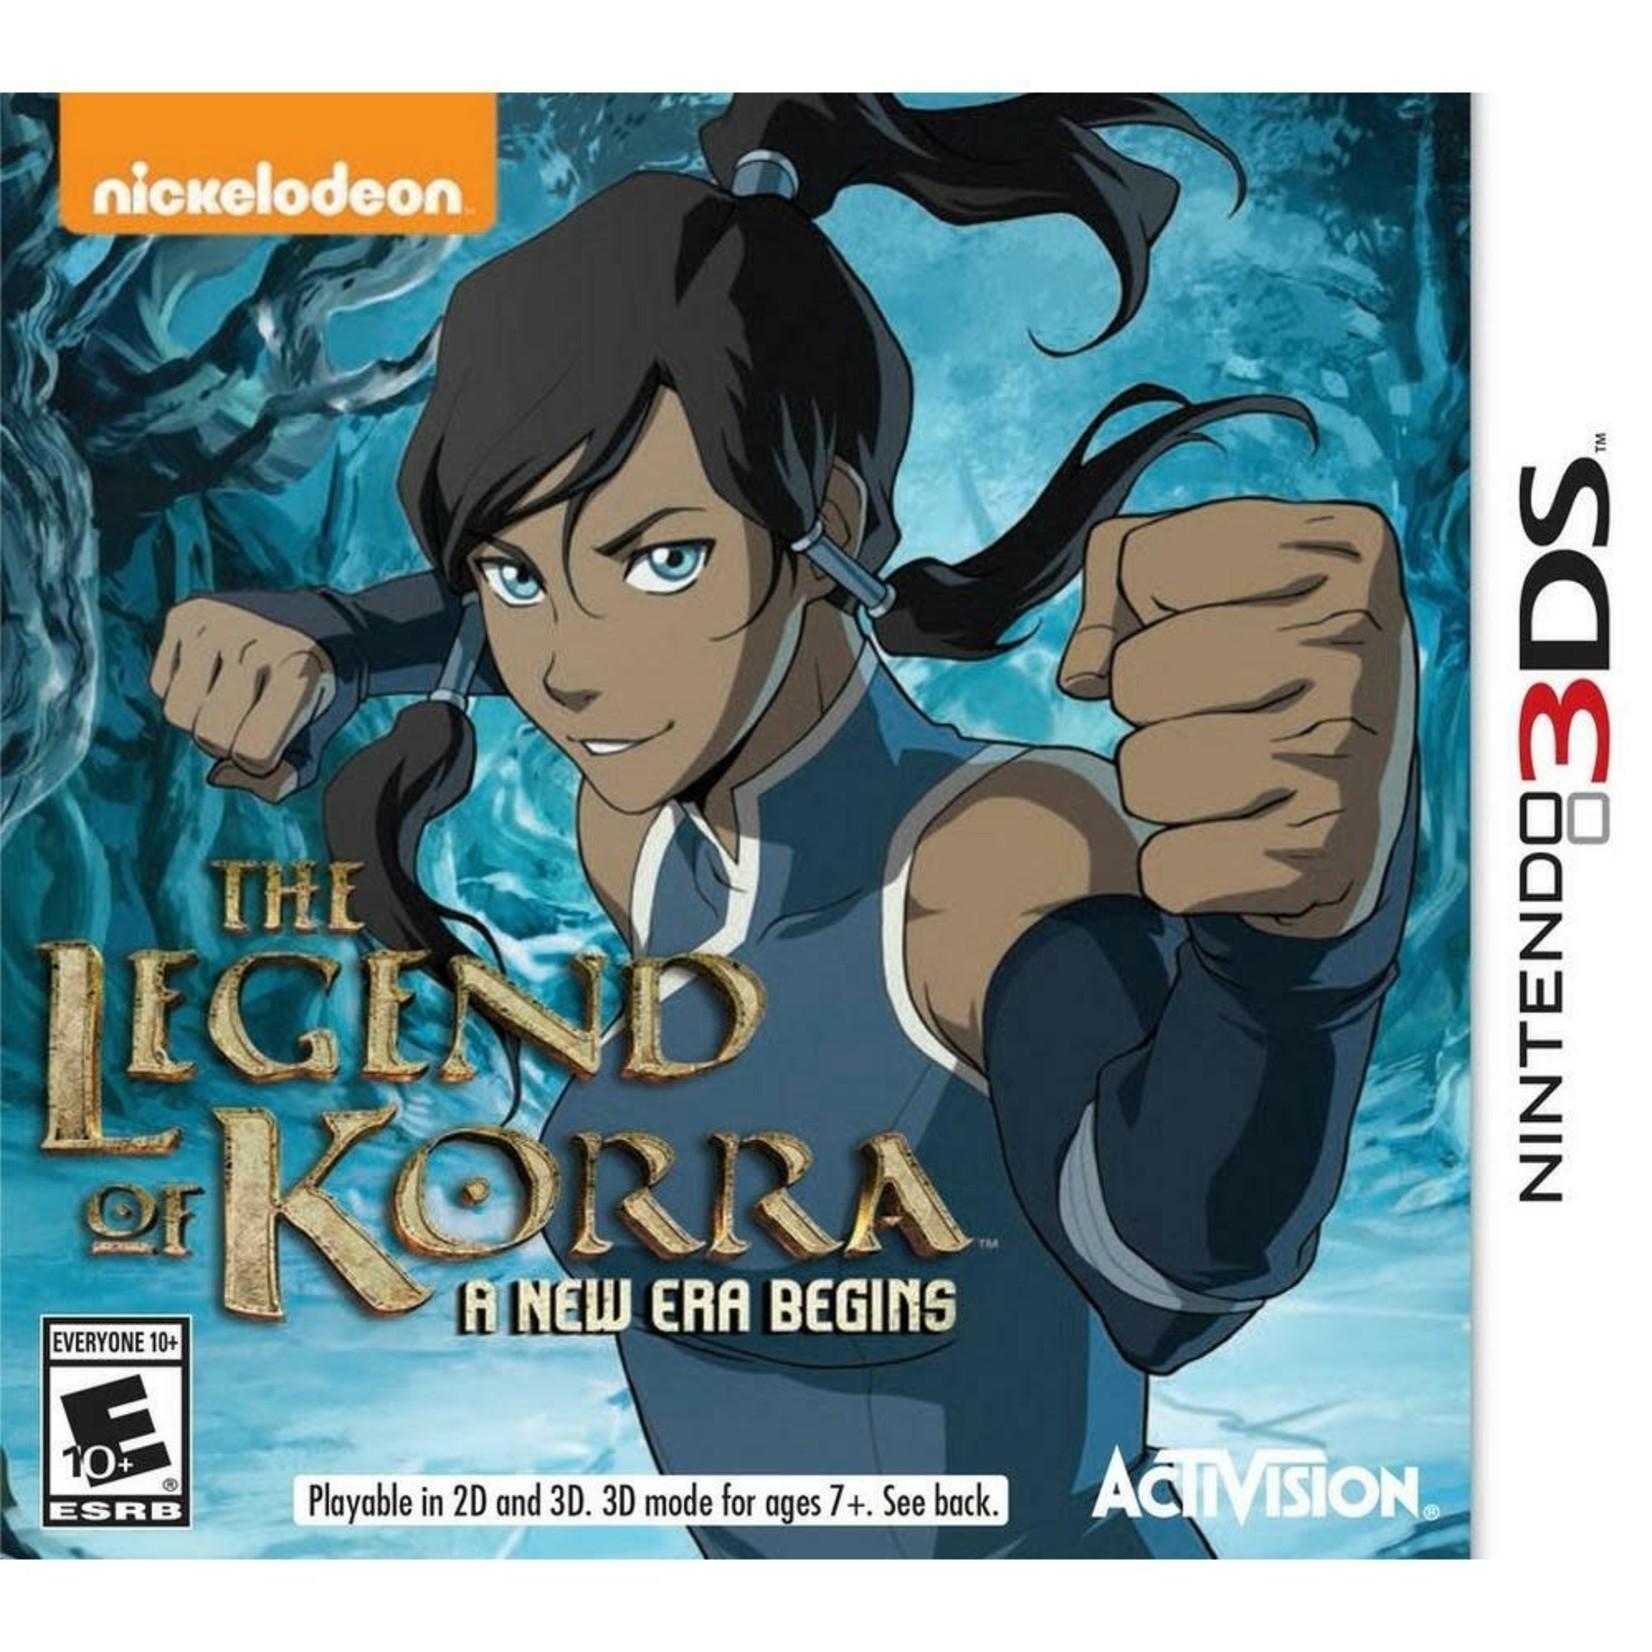 3DS-The Legend of Korra: A New Era Begins